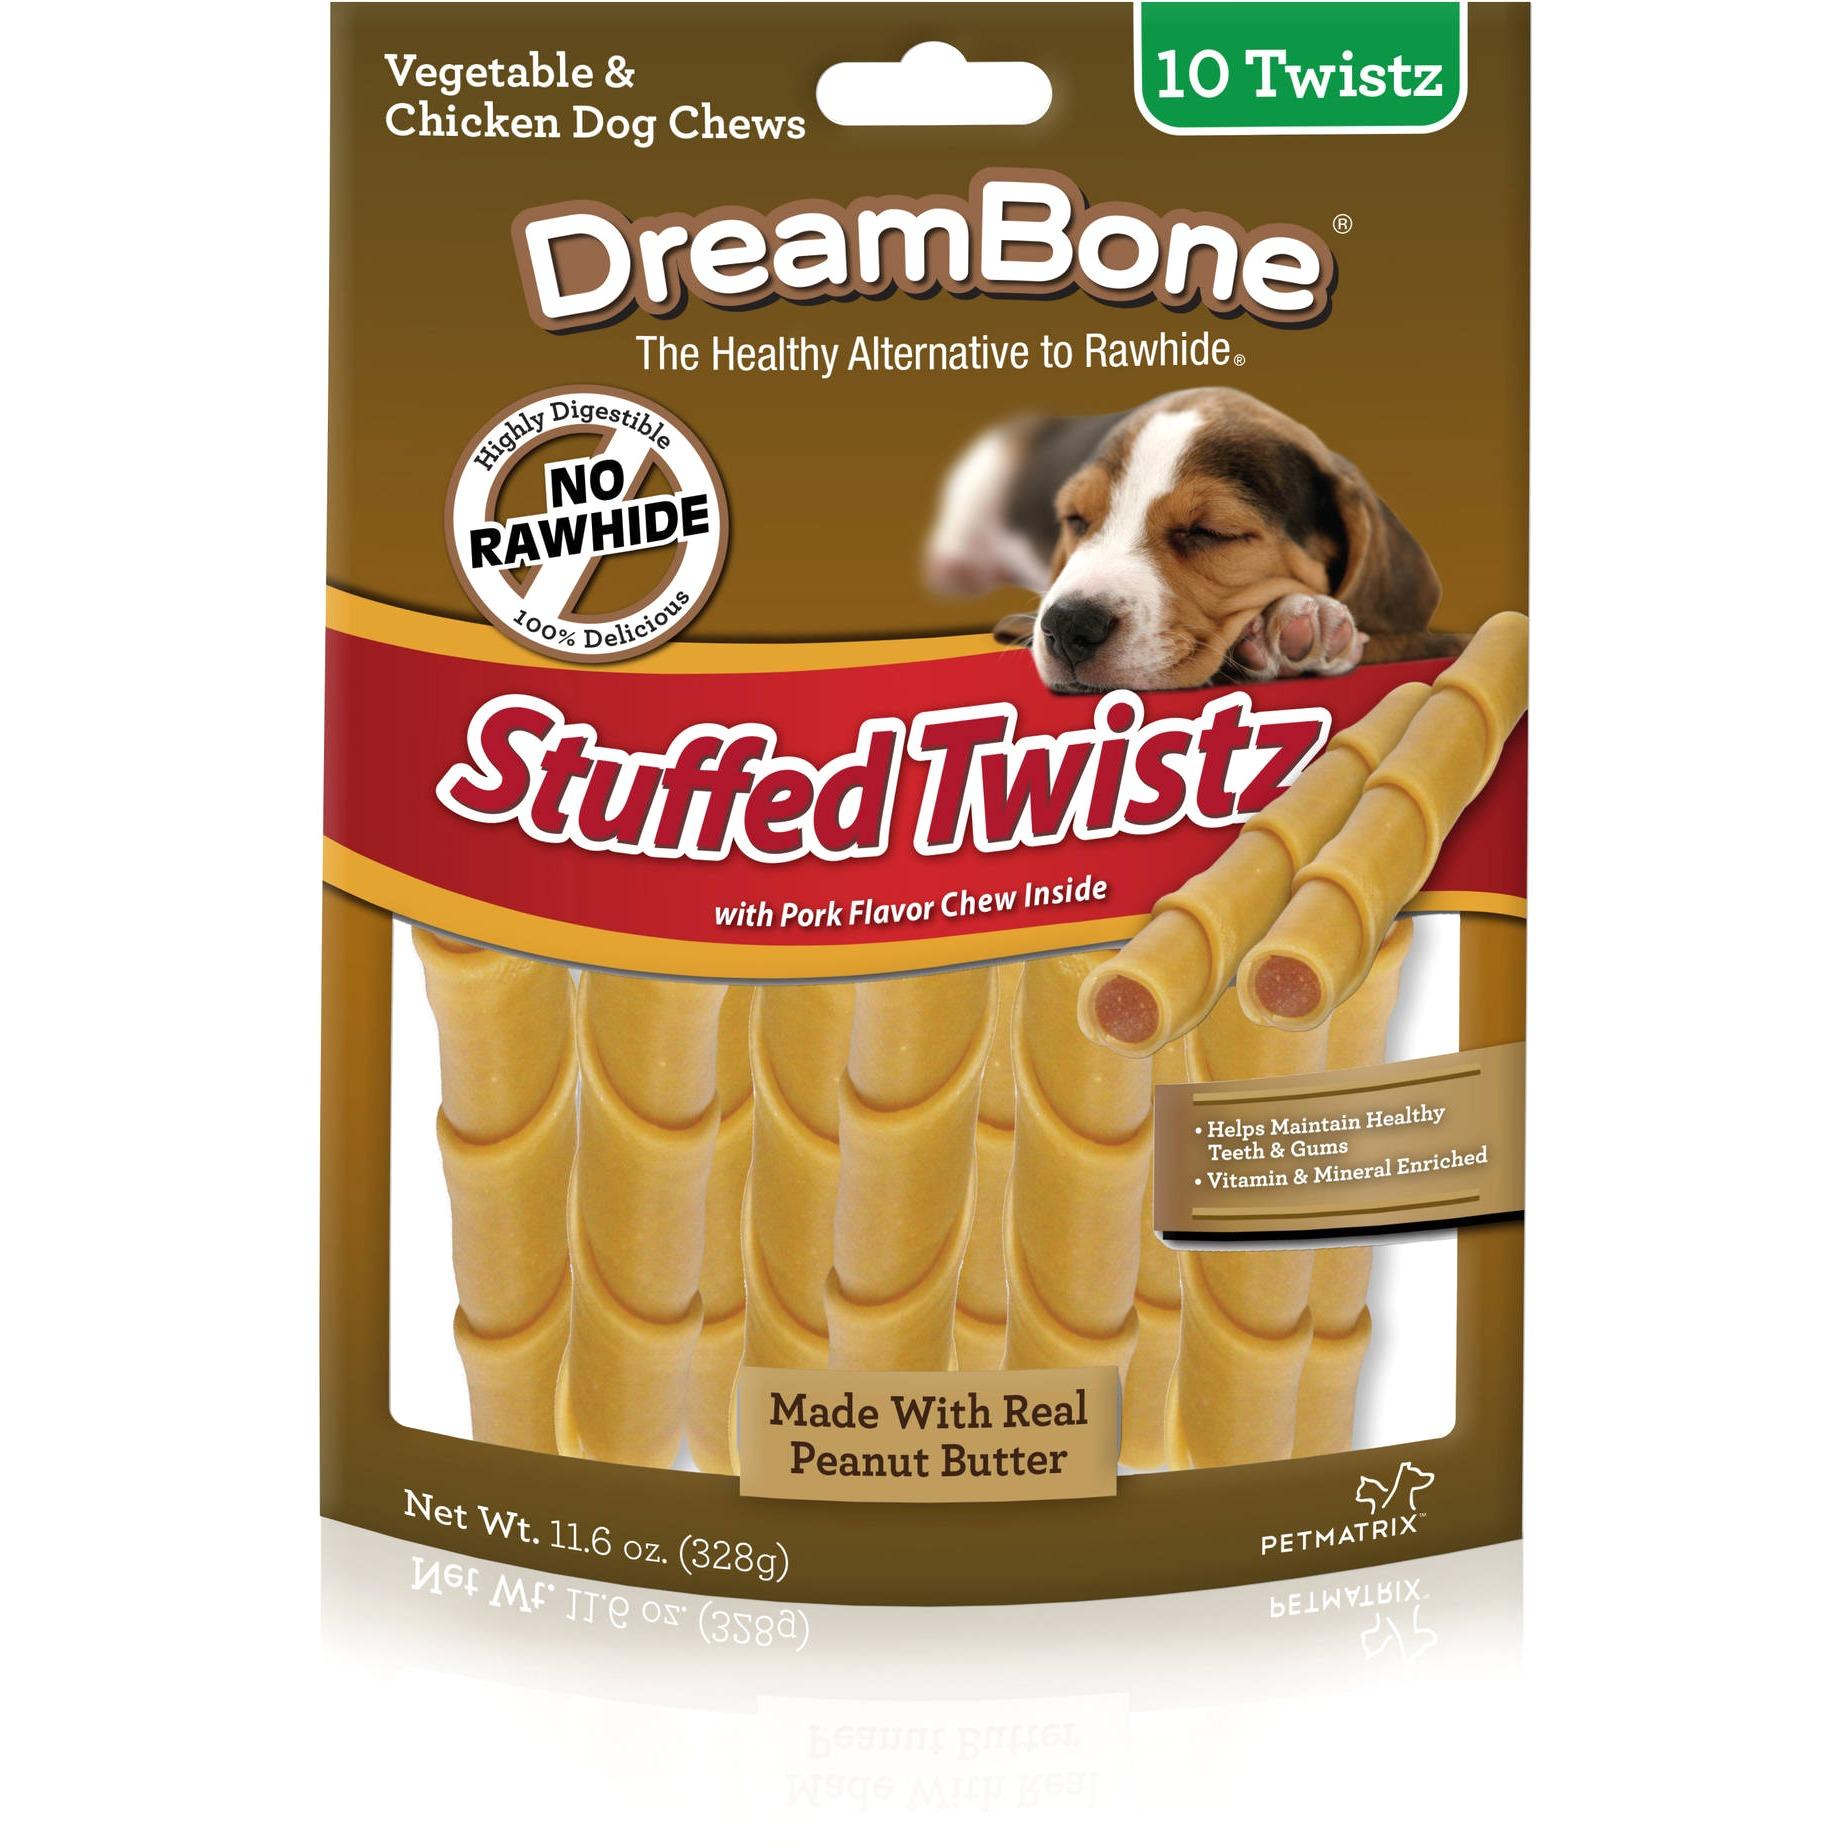 DreamBone Stuffed Twistz Dog Chew w/ Peanut Butter & Pork, 10-Count